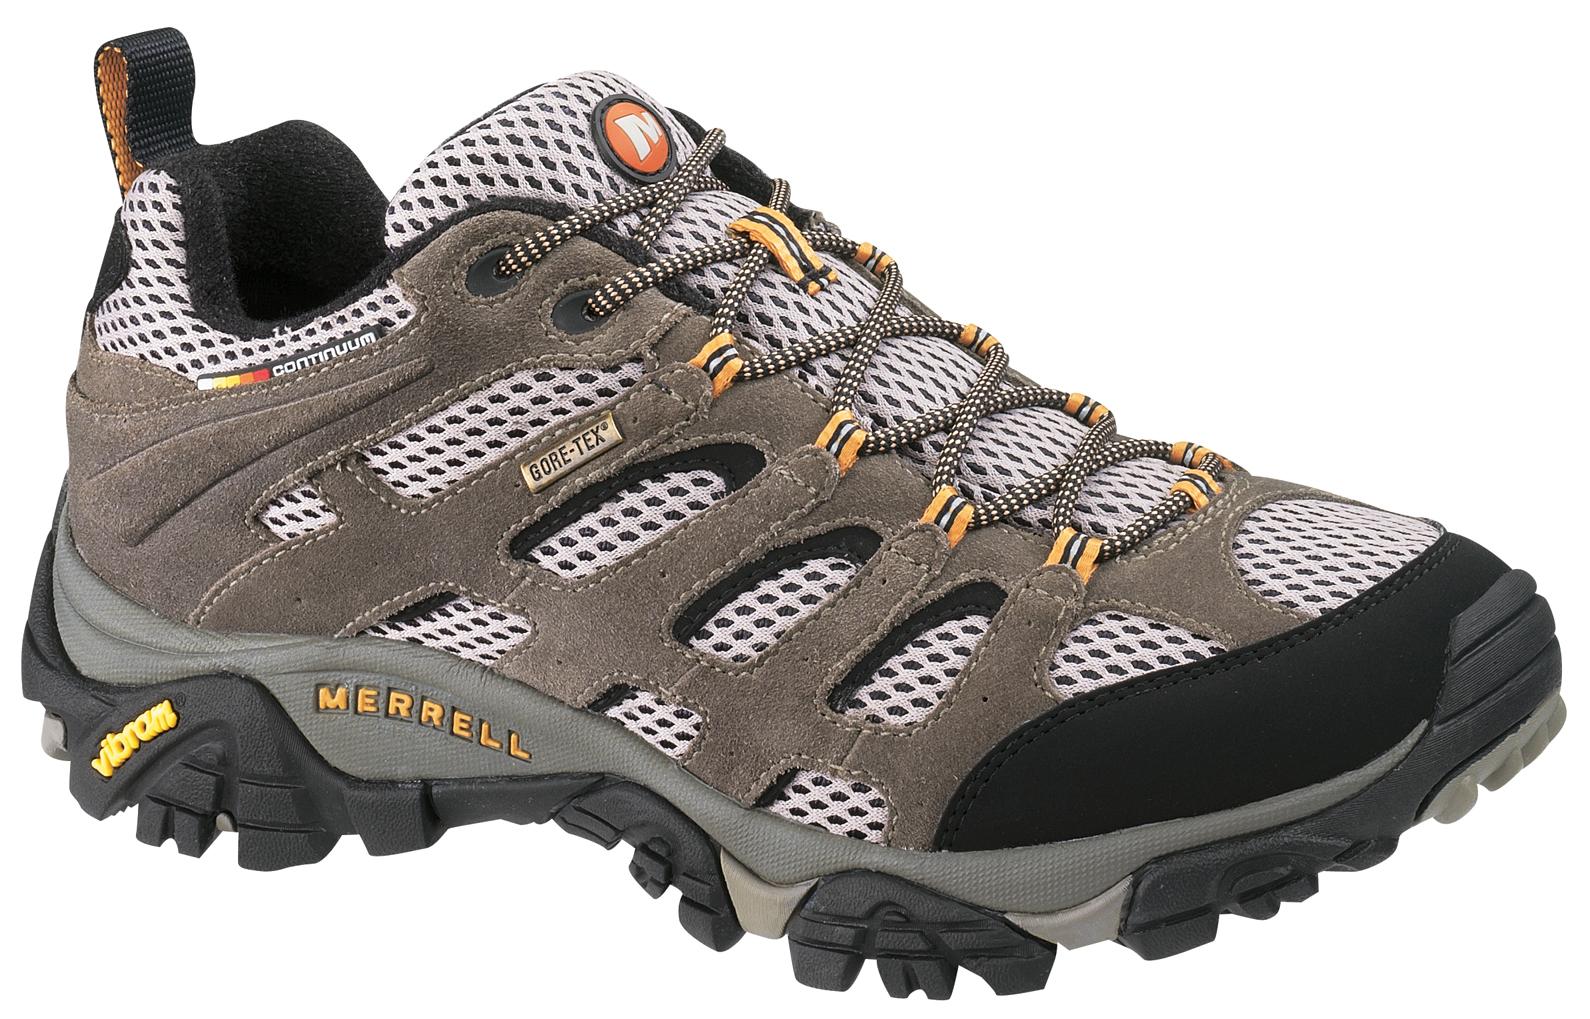 Merrell Moab Gore-Tex XCR 87107 EUR 42